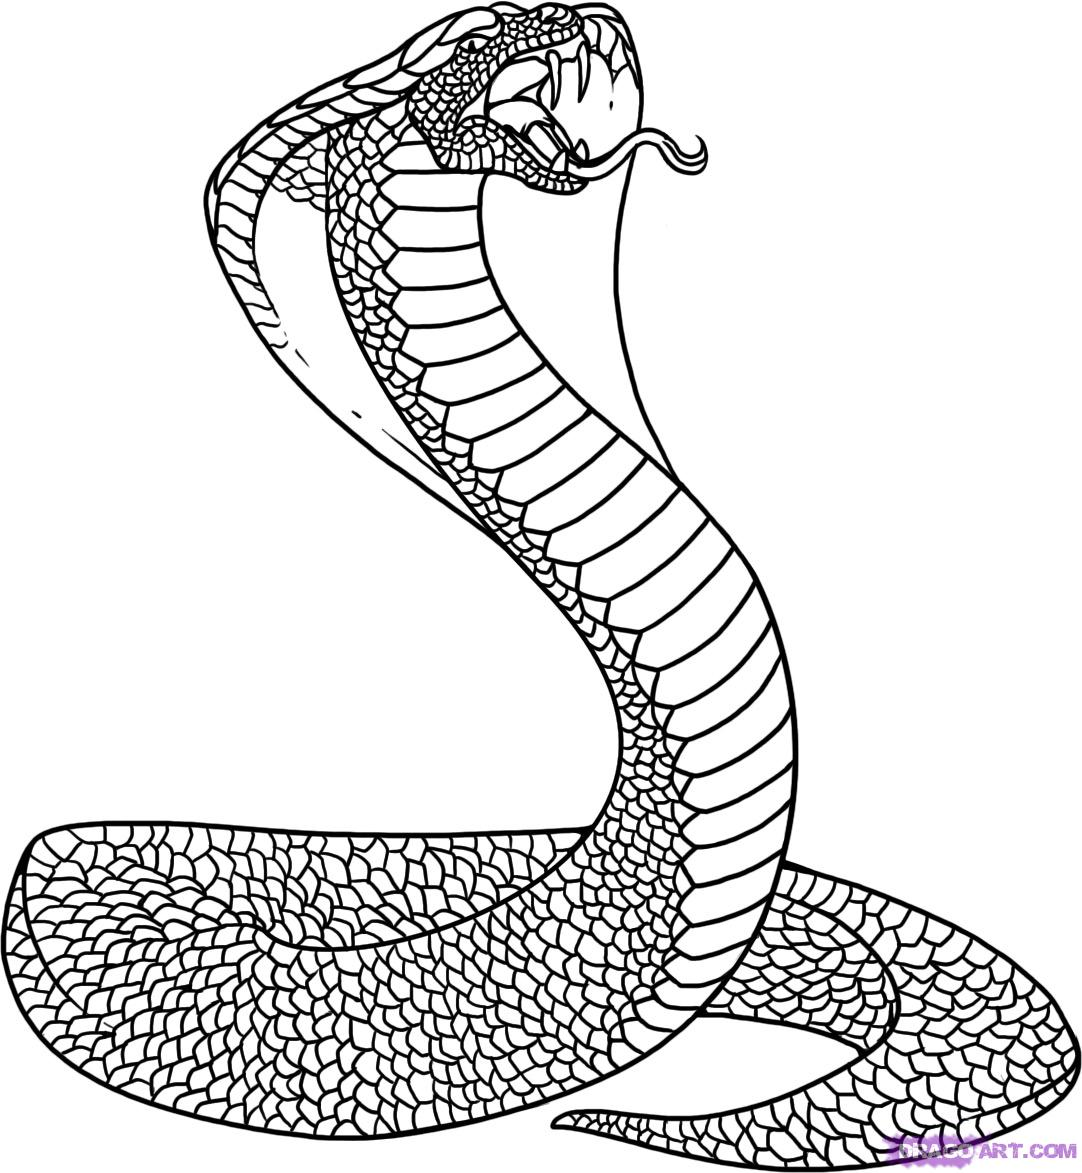 Drawn serpent How Step cobra king draw